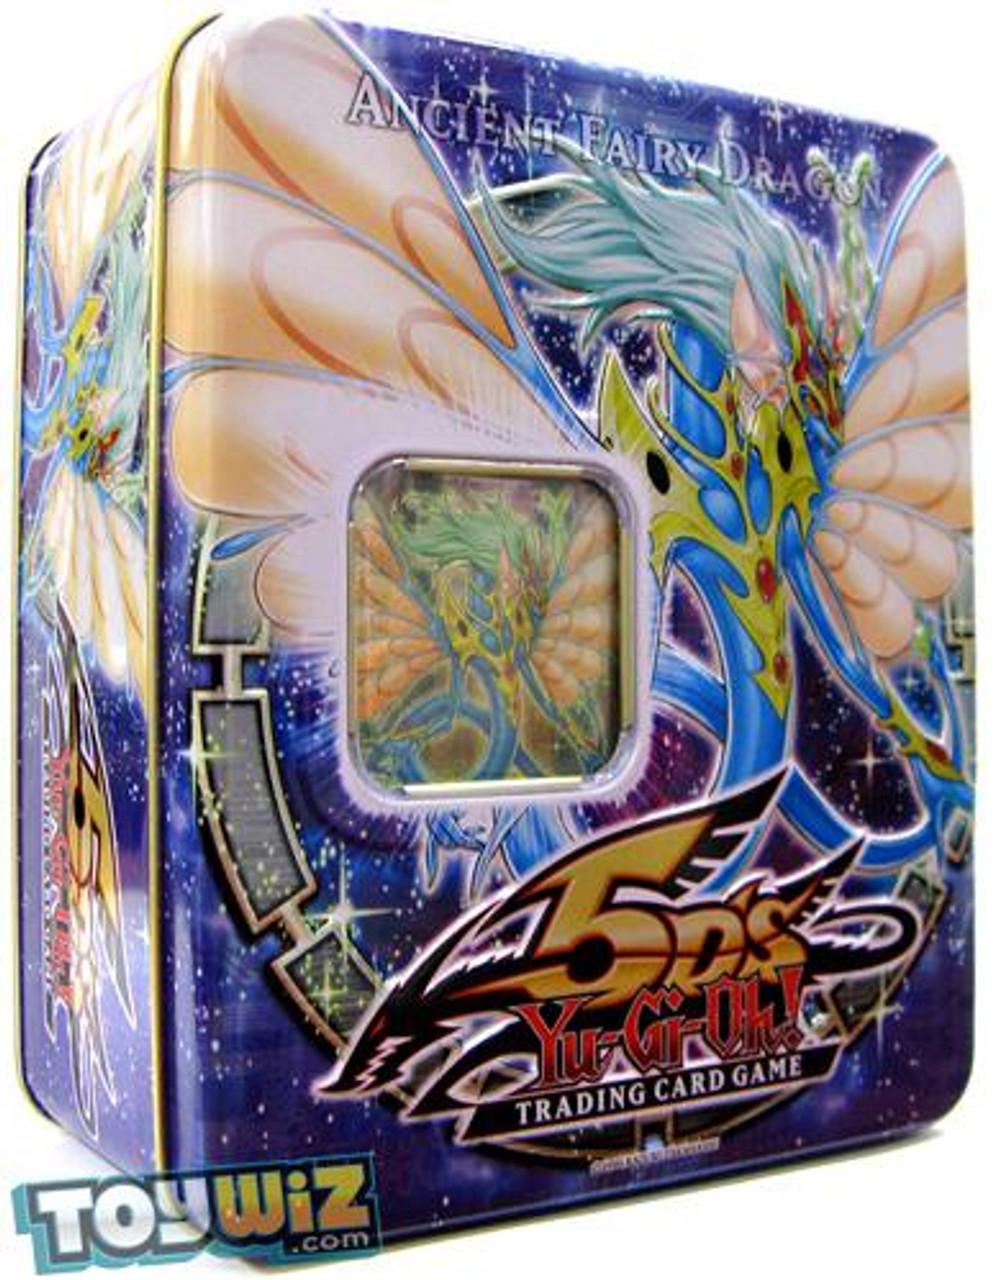 YuGiOh 5D's 2009 Collector Tin Ancient Fairy Dragon Collector Tin [Sealed]